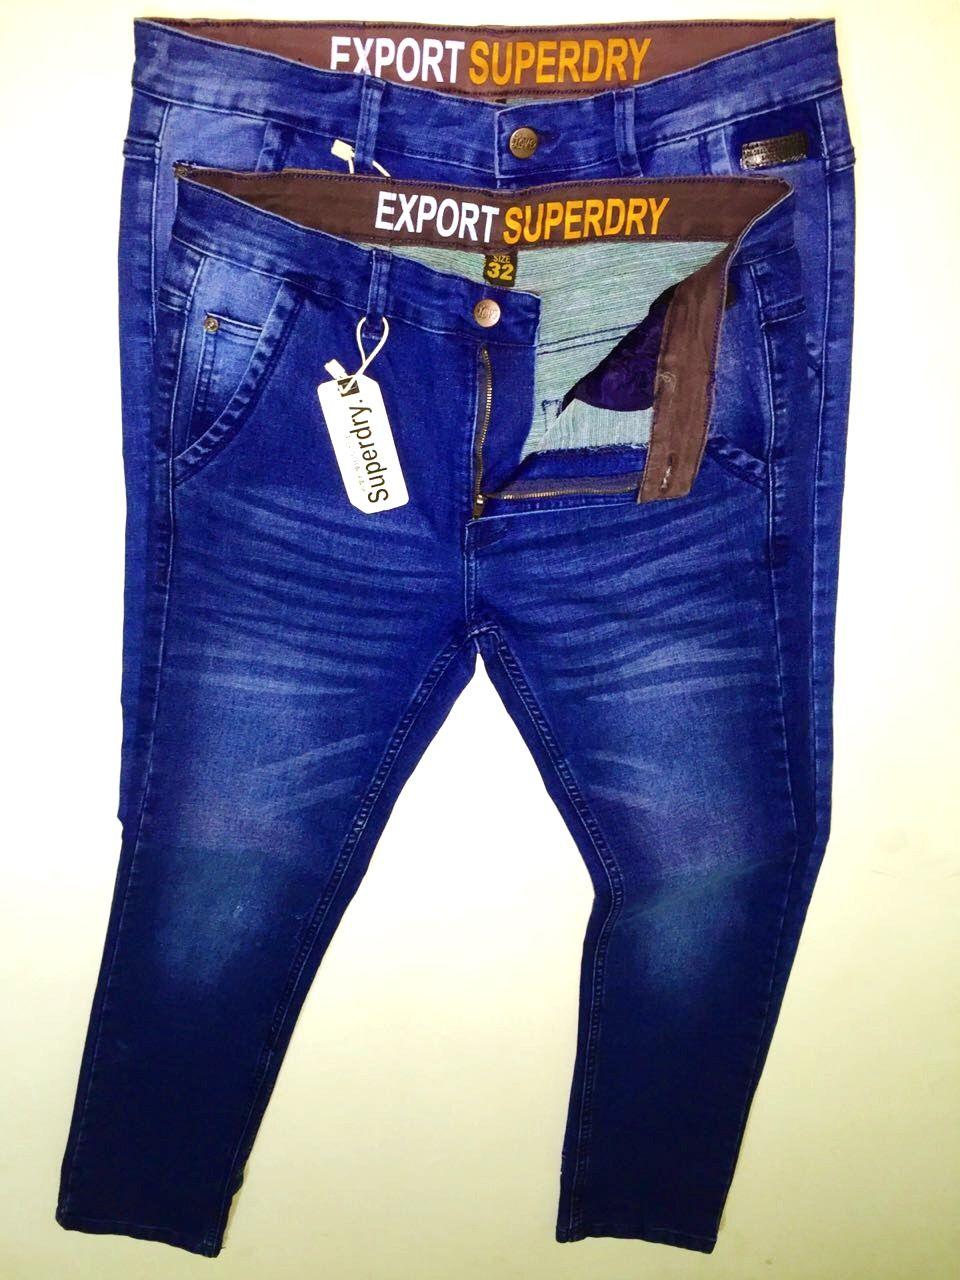 22e1603f4a3 #denim #pants #mens #woman #blue #jeans #jeanswear #wholesale #manufacturer  #bangladesh Contact Us : Website : www.minmaxst.com Email :  info@minmaxst.com